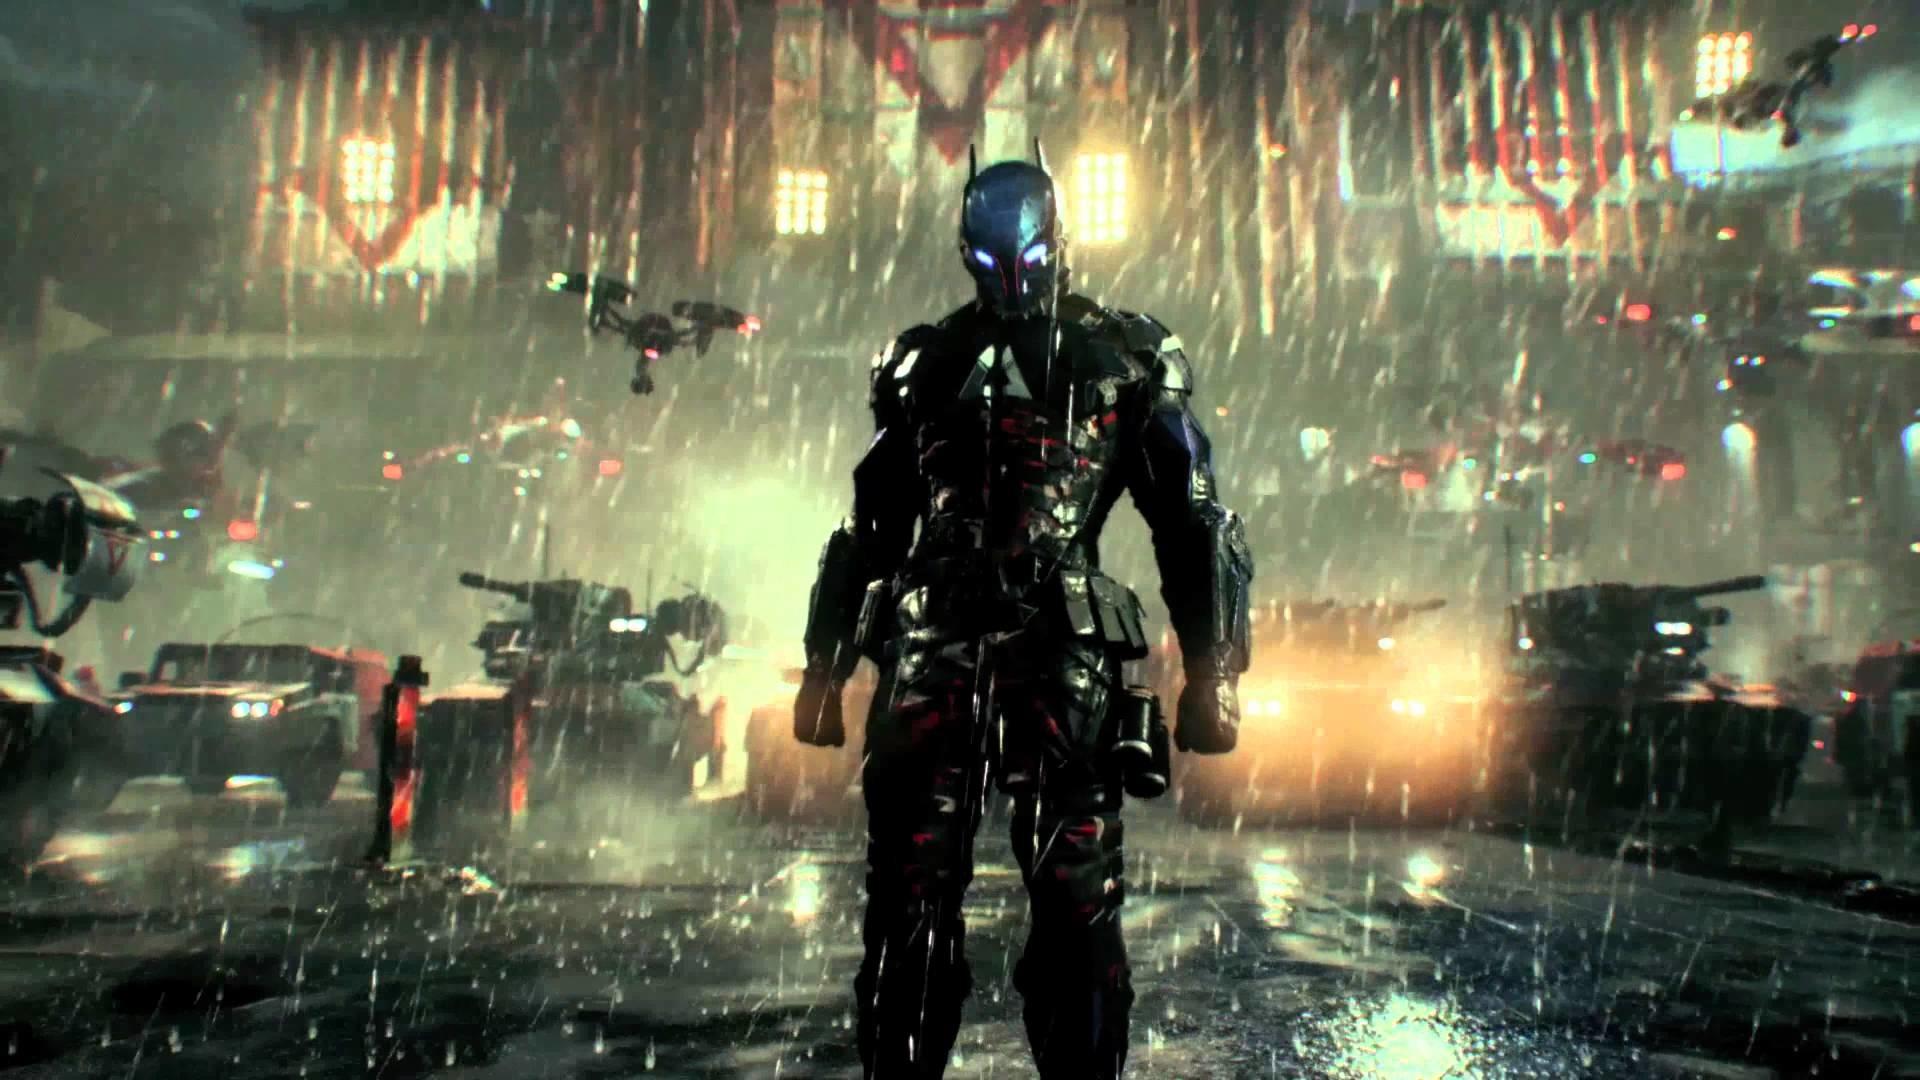 "Batman Arkham Knight in true UltraHD 4K _ Gameplay Trailer ""All Who Follow  You"" for PS4 XboxOne PC"